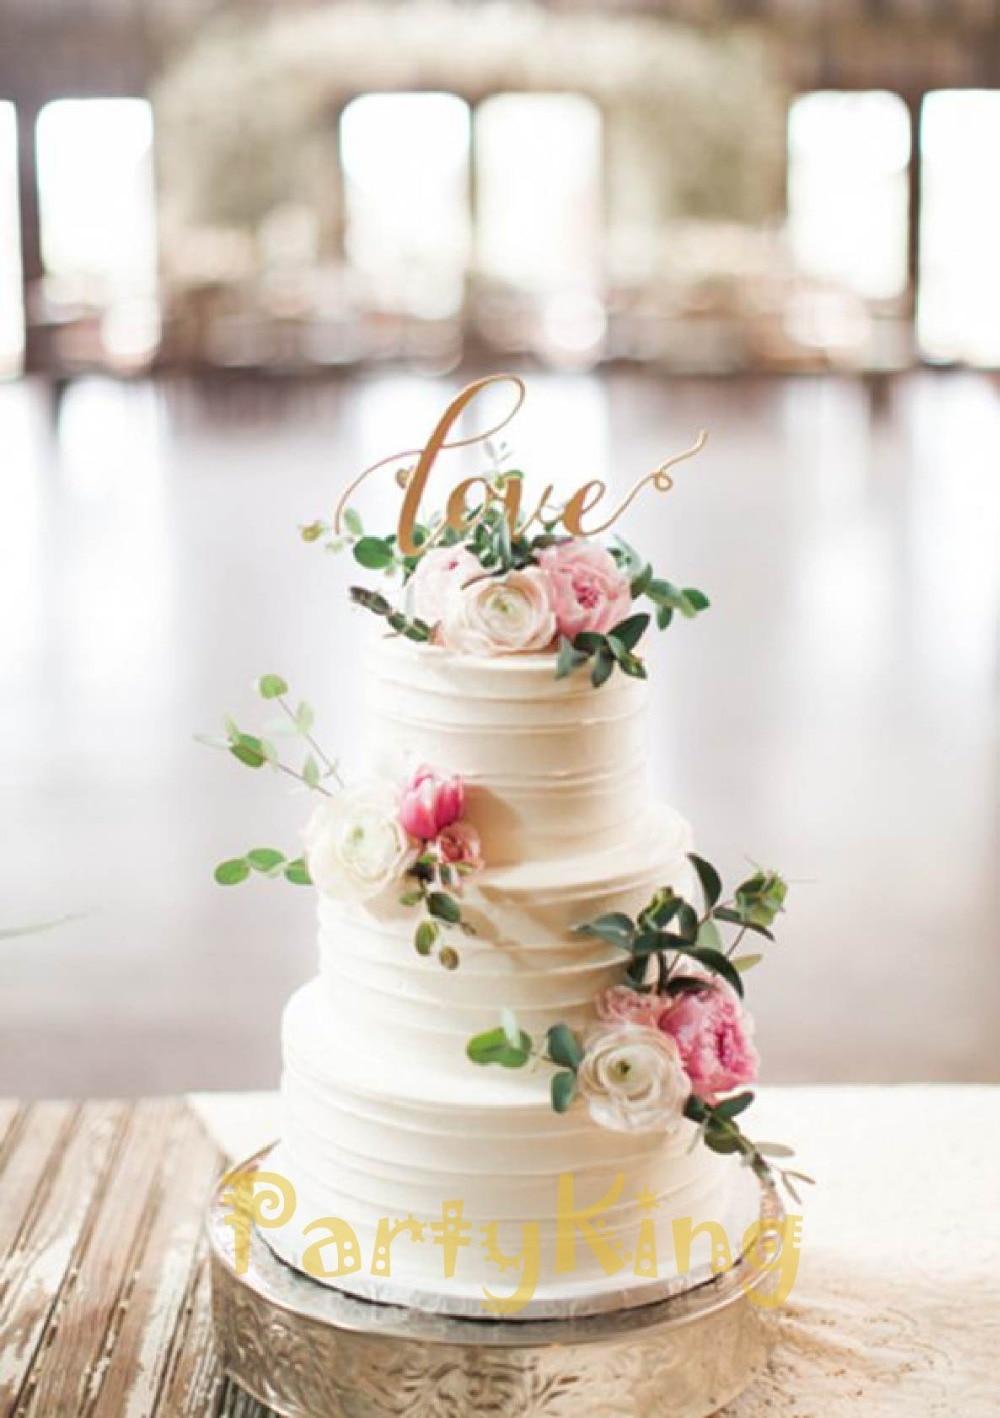 personalized wedding cake topper LOVE Bing Gold Wedding Cake Topper free shipping birthday